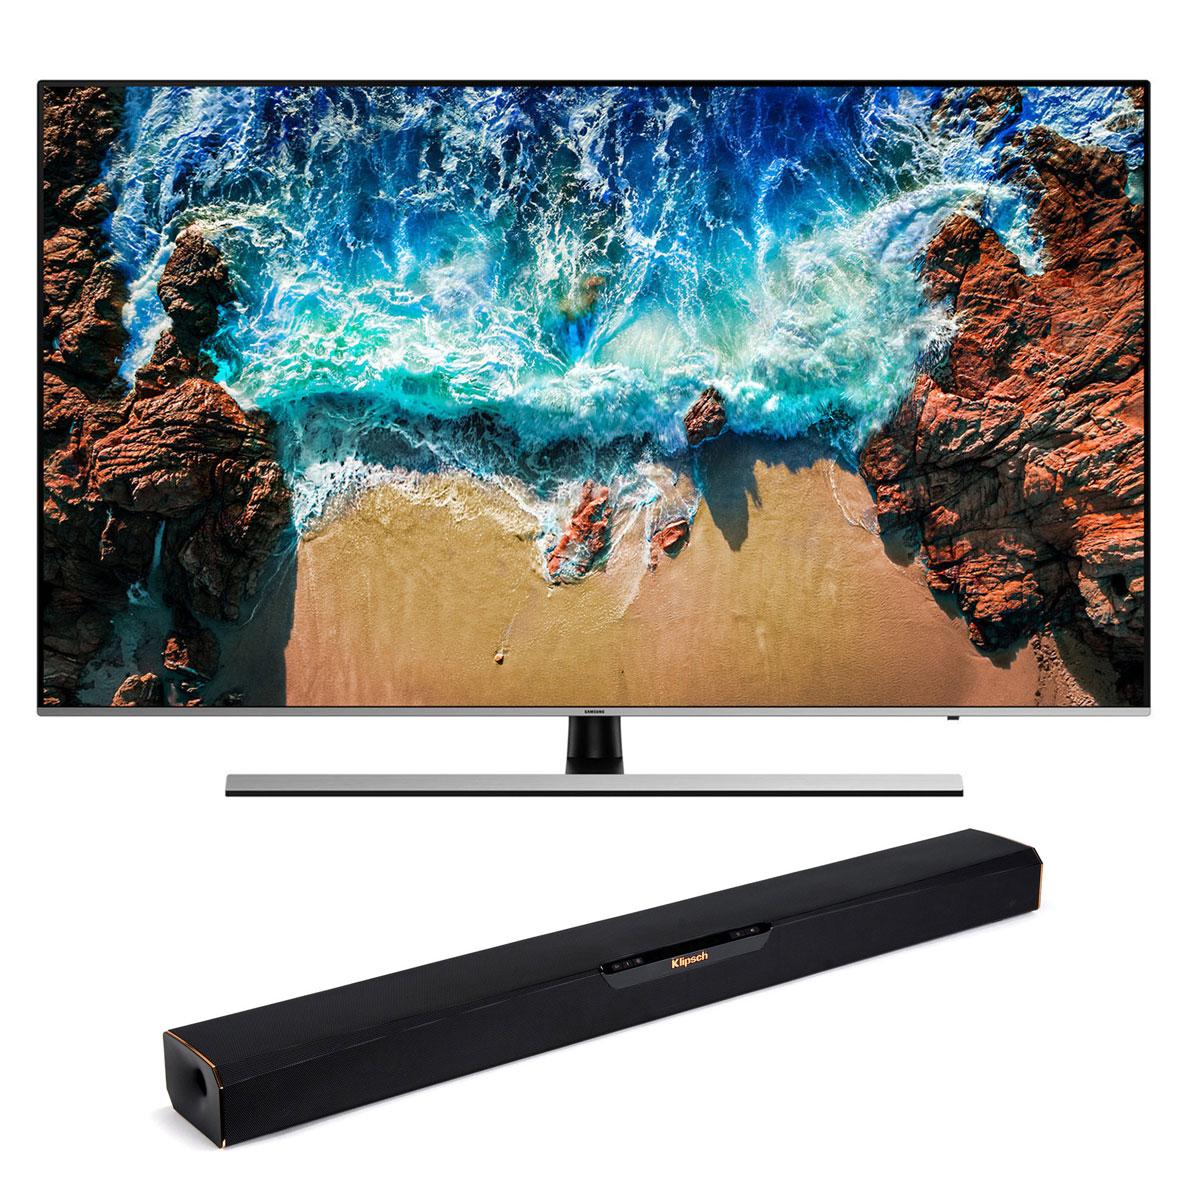 "TV Samsung UE55NU8005 + Klipsch RSB-3 Téléviseur LED 4K 55"" (140 cm) 16/9 - 3840 x 2160 pixels - Ultra HD - HDR - Wi-Fi - Bluetooth - 2500 PQI (dalle native 100 Hz) + Barre de son 2.0 56 Watts avec technologie Bluetooth"